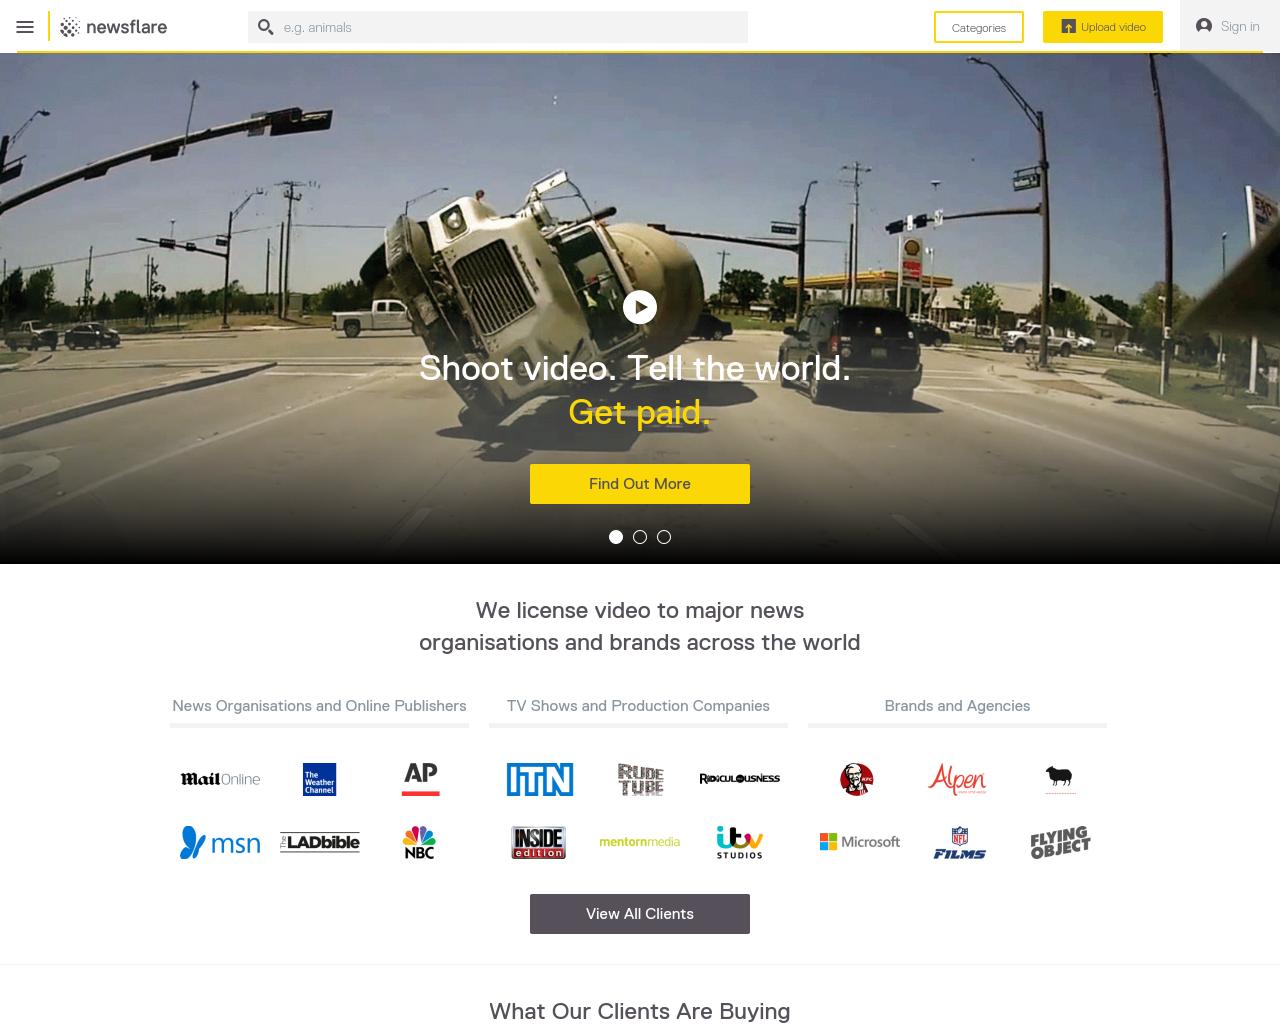 Newsflare-Advertising-Reviews-Pricing